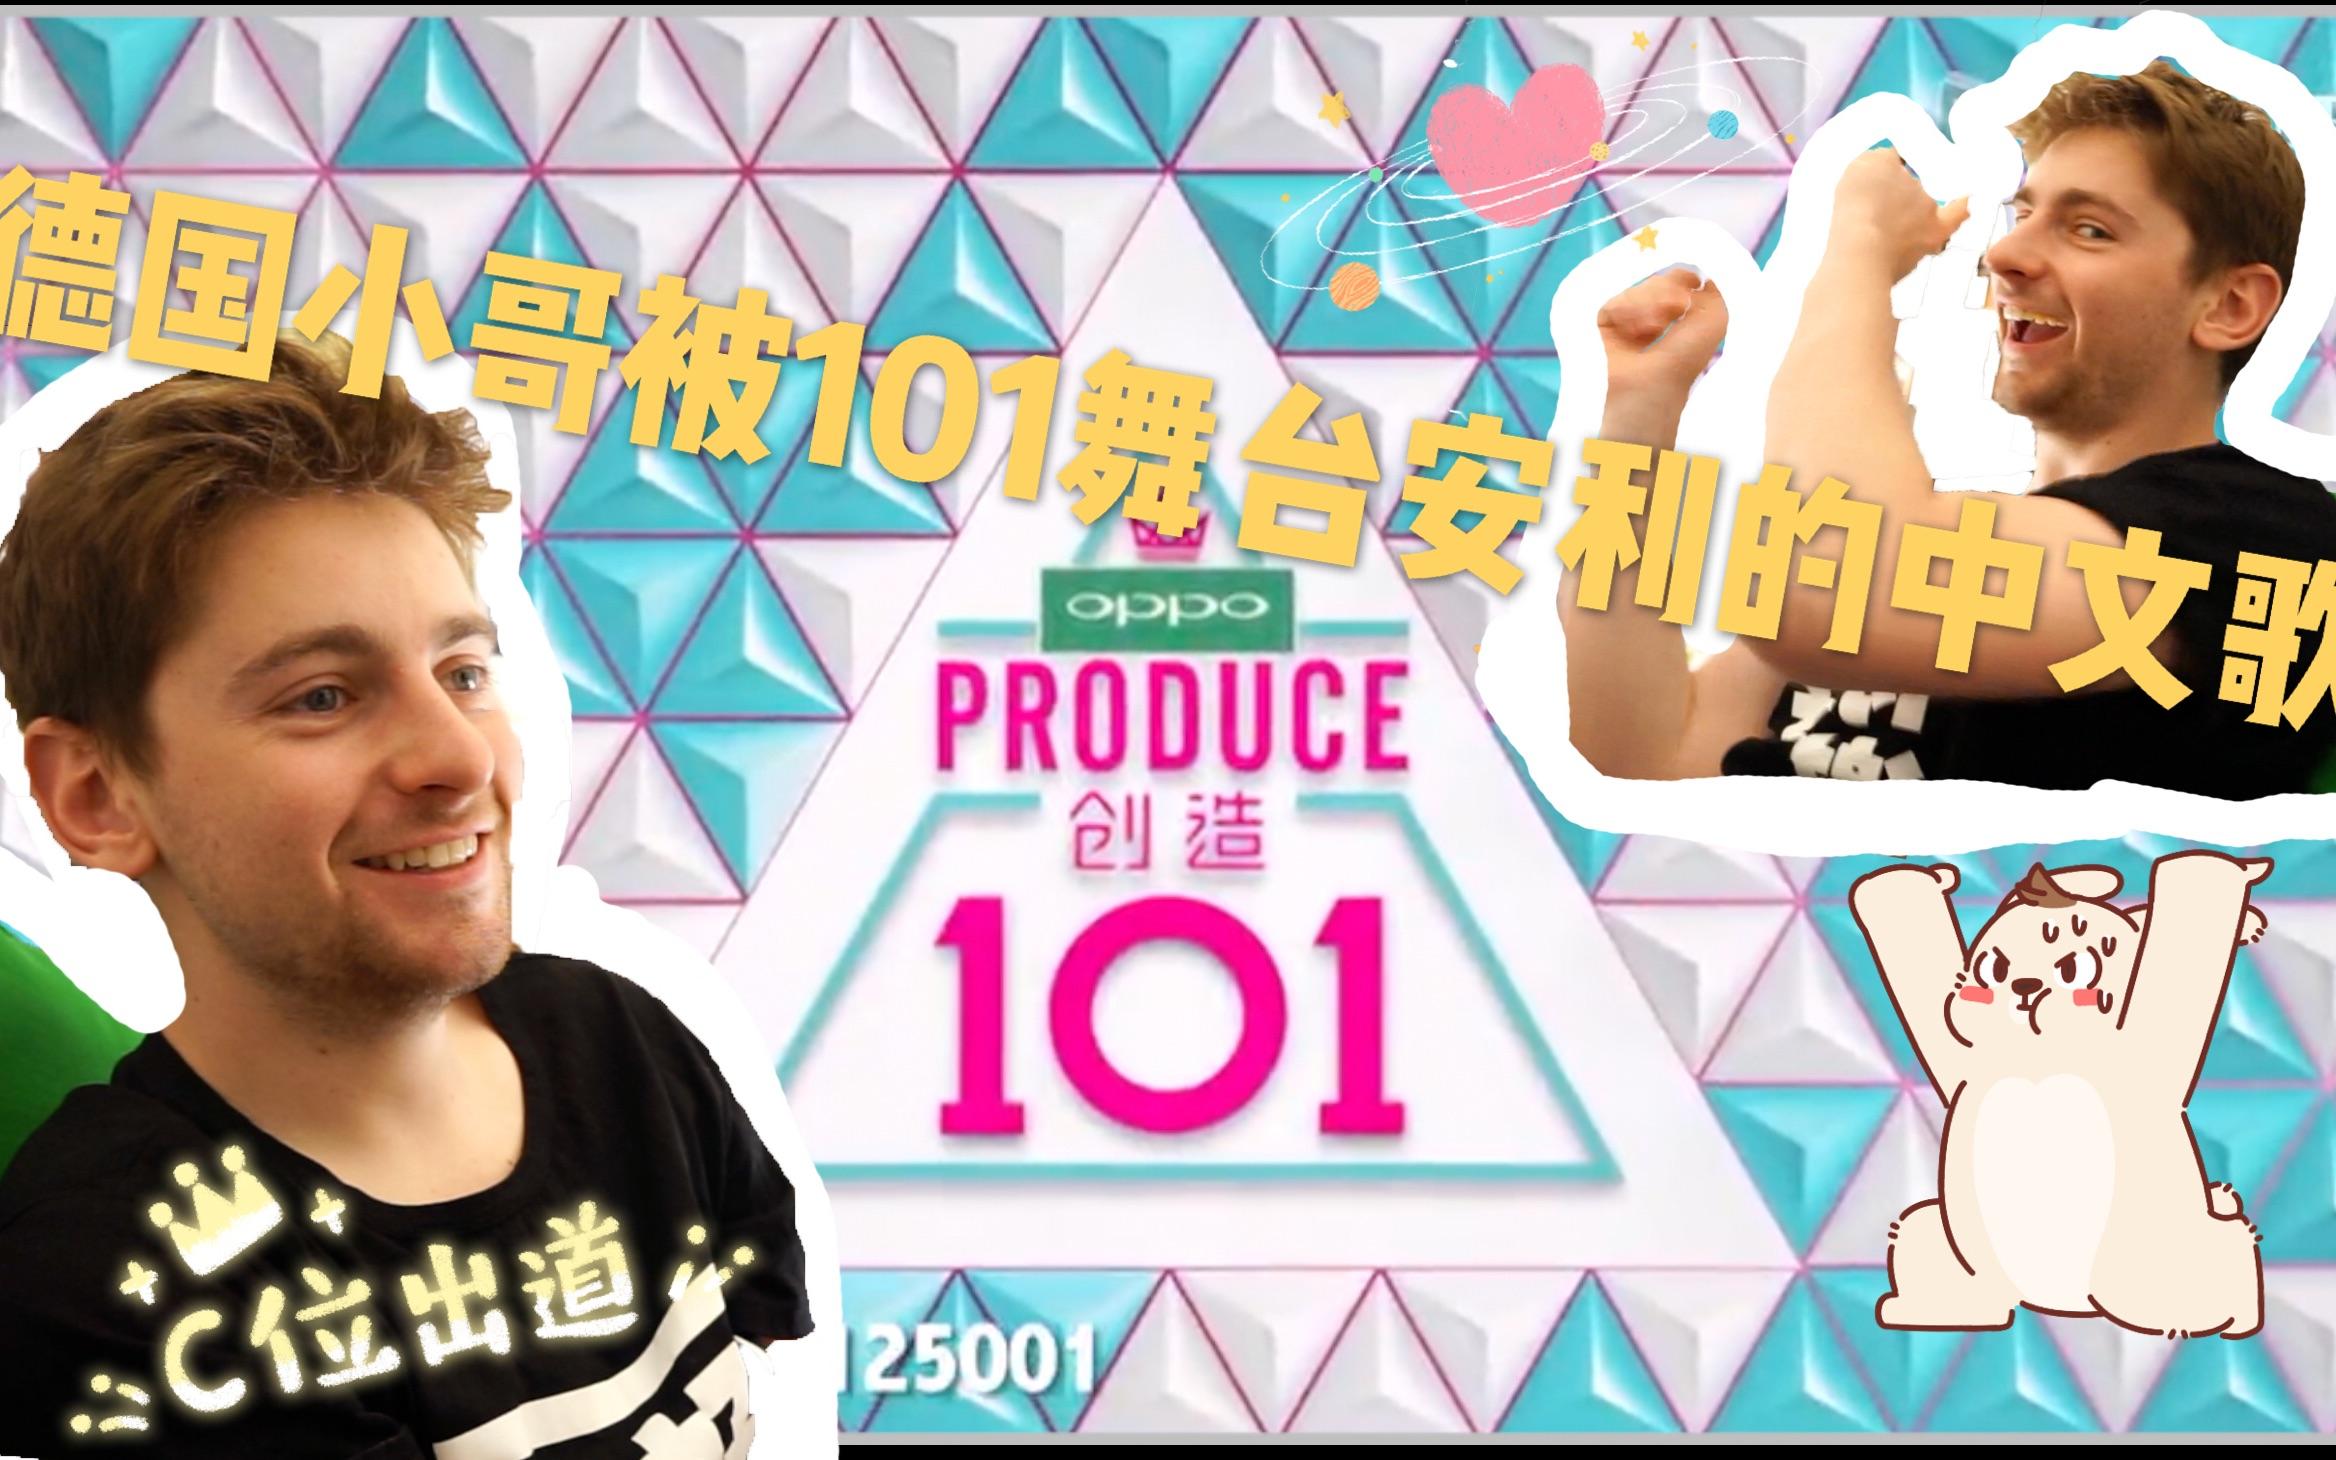 【創造101】德國小哥被101舞臺安利洗腦的中文歌TOP3 排名不分先后_嗶哩嗶哩 (゜-゜)つロ 干杯~-bilibili